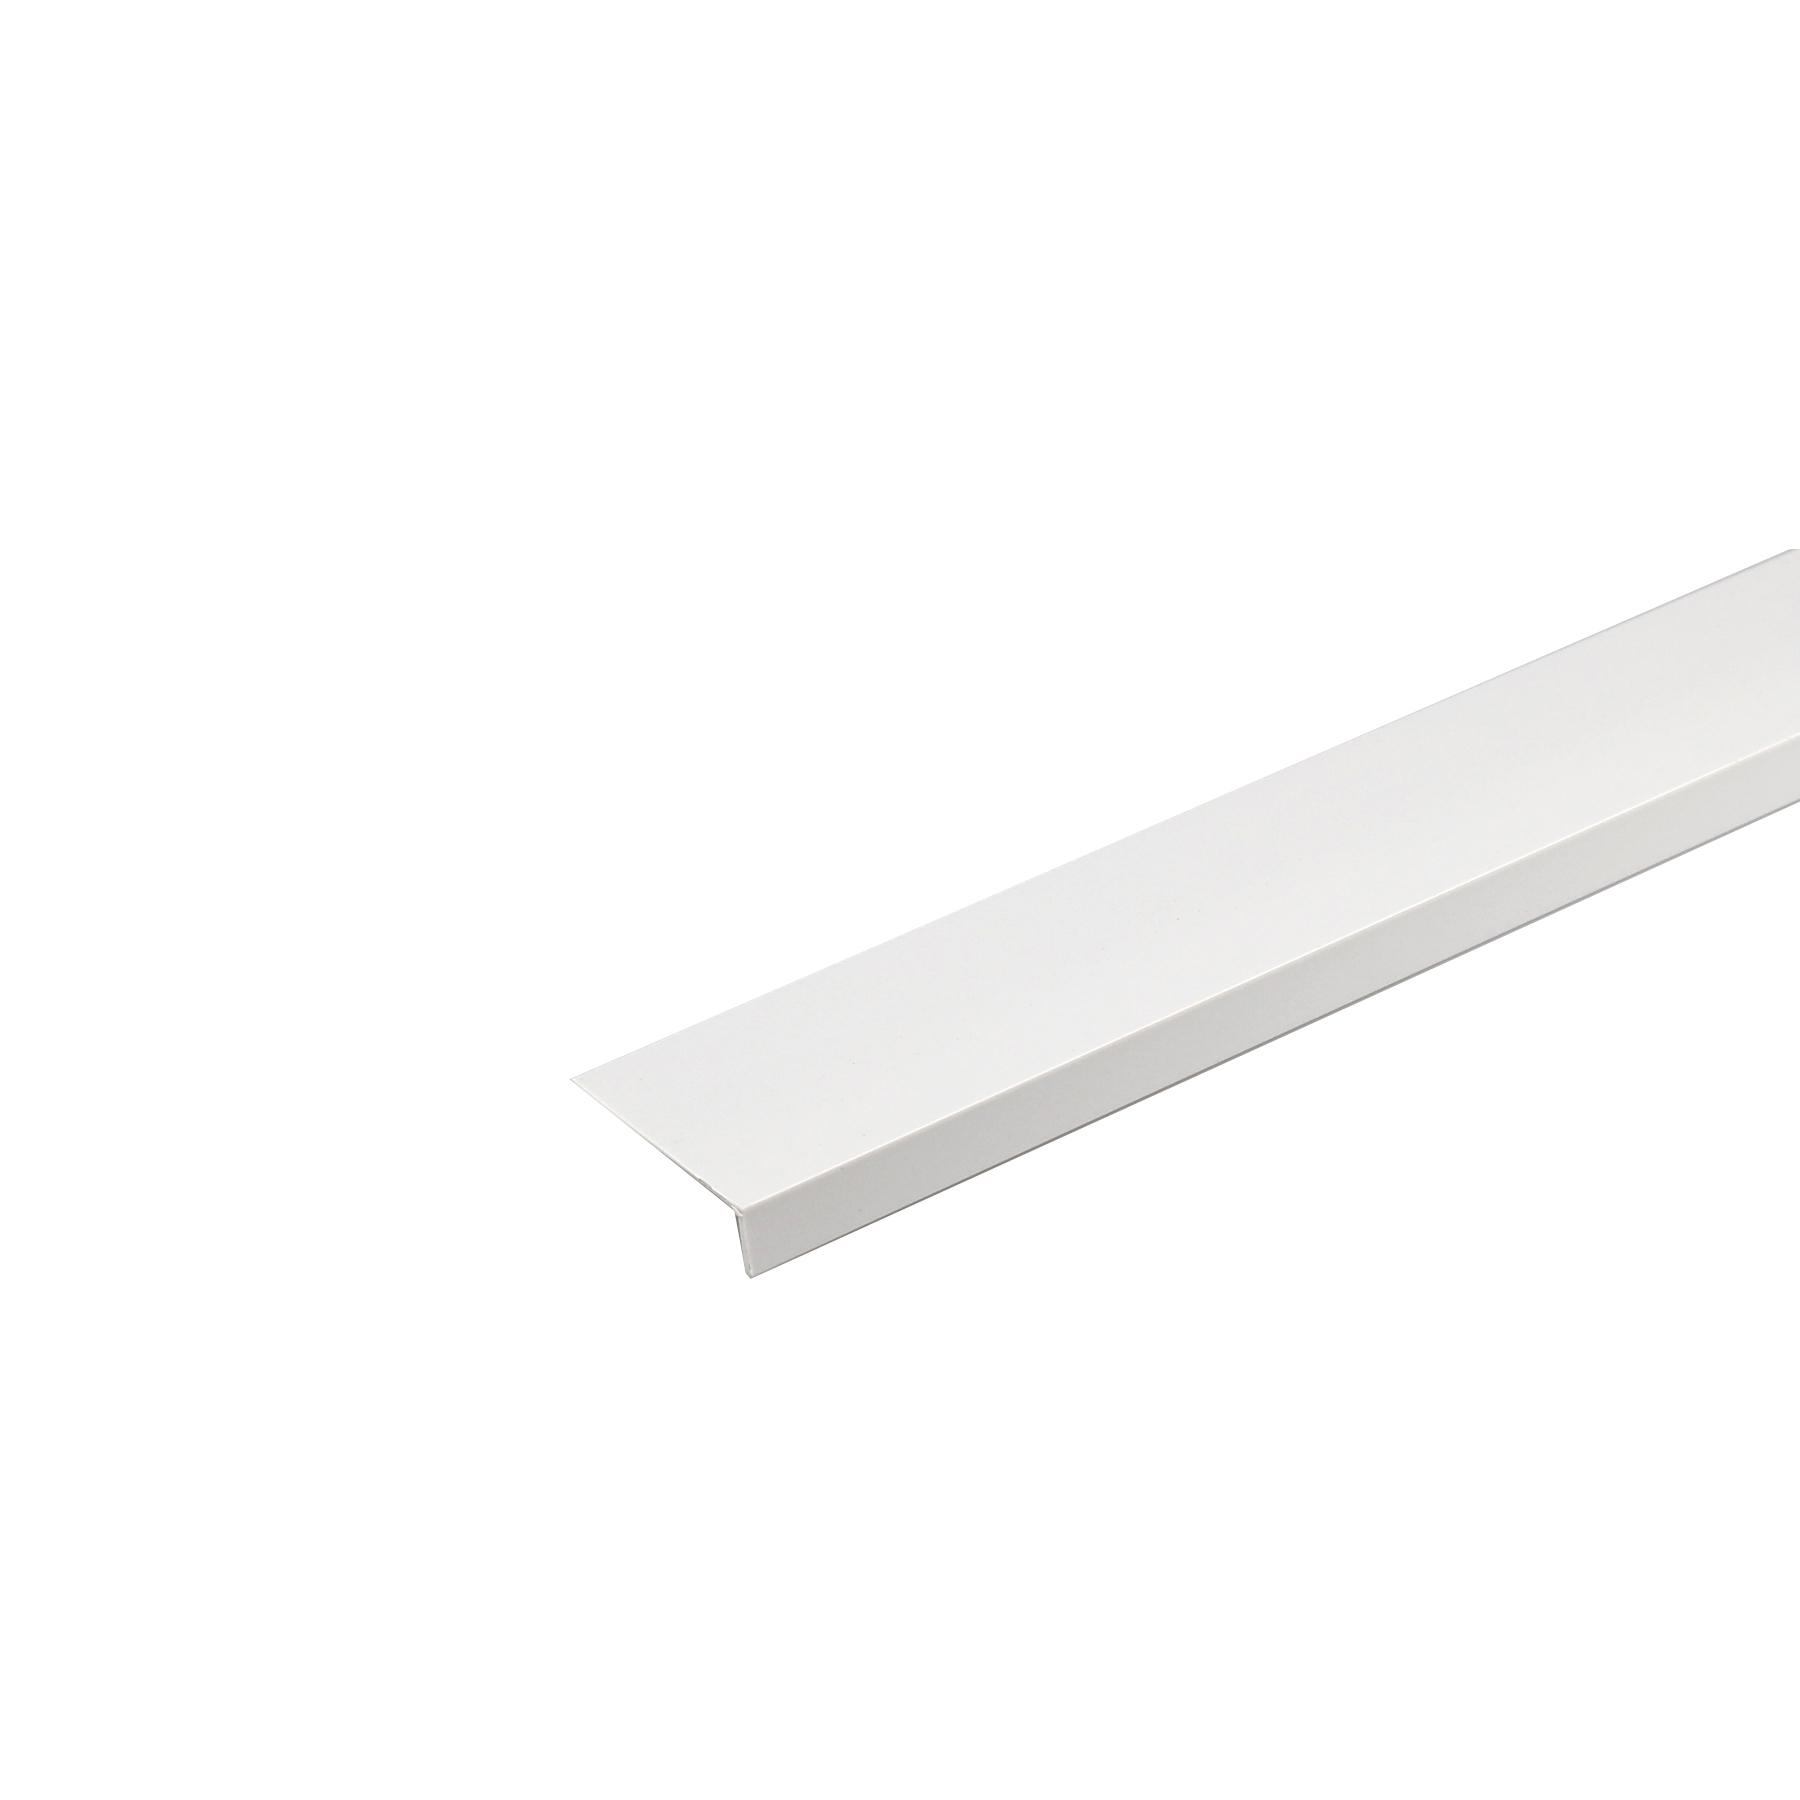 Perfil Plano PVC Porcelana 1mx1,7cm